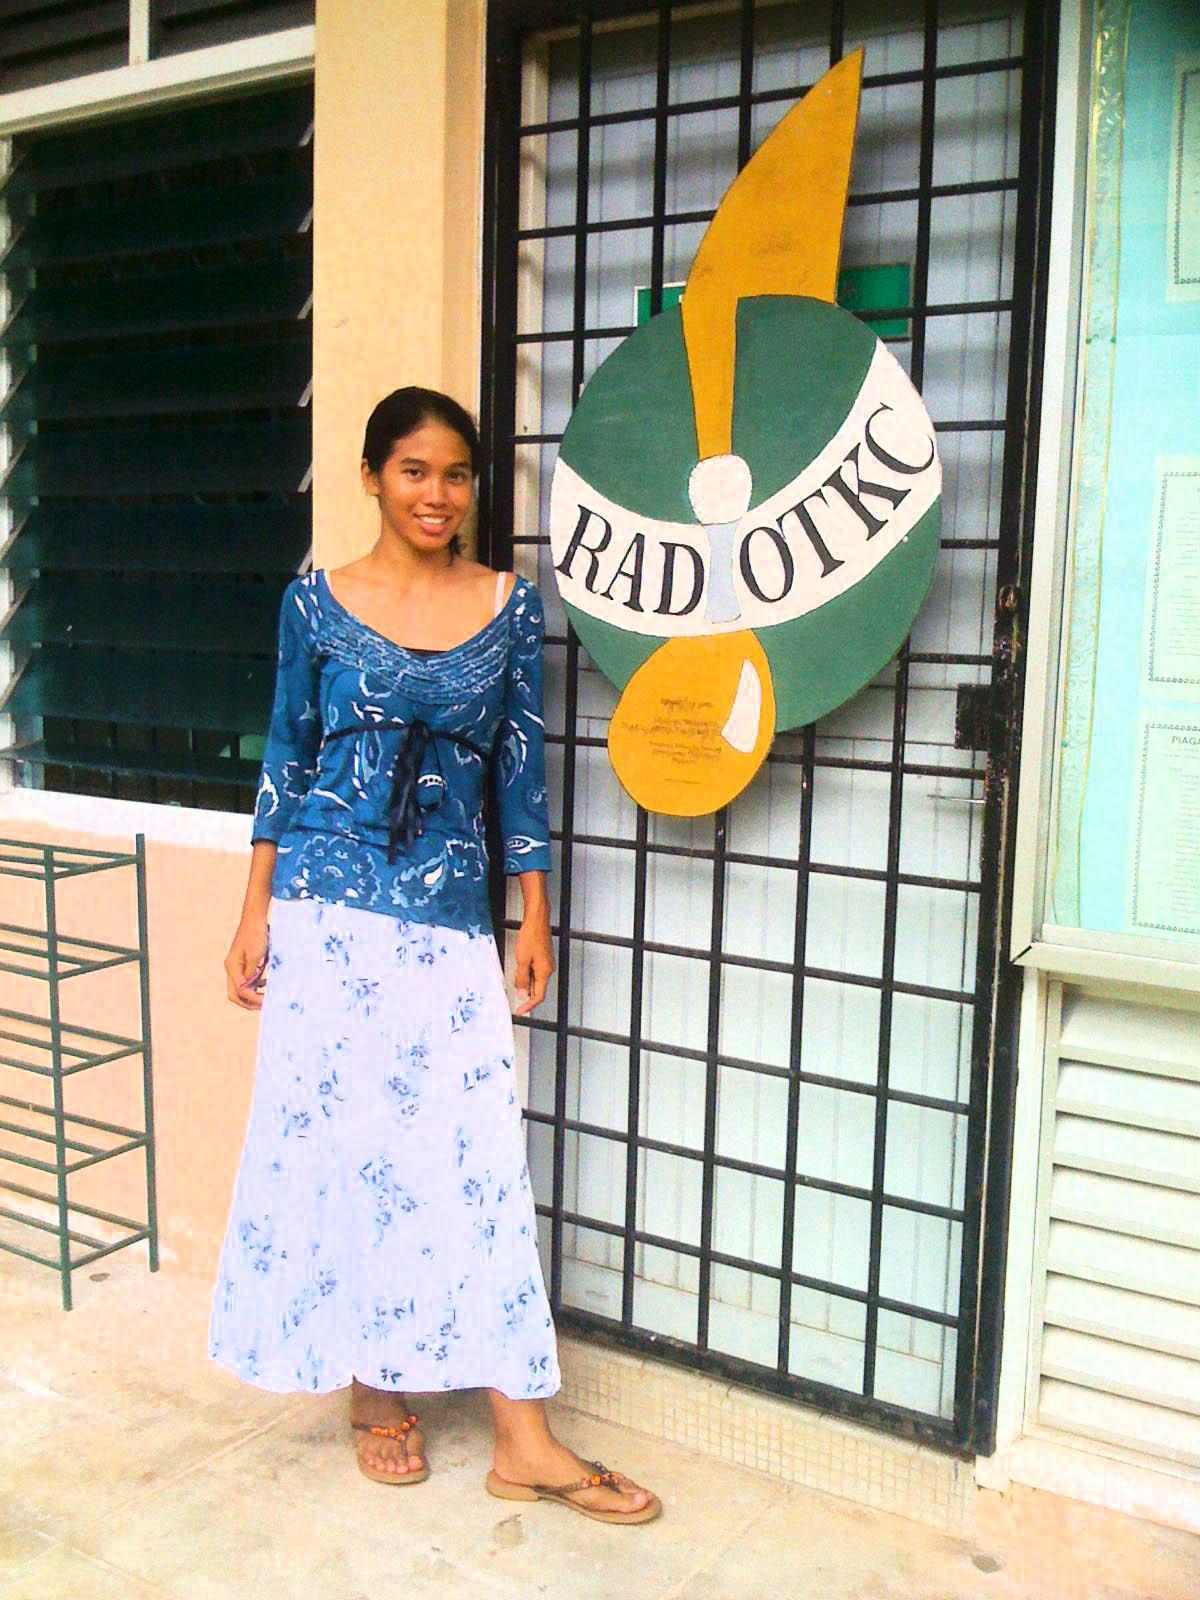 cherishing the high skool memories..hahaha..jalan2 at TKC after Eddy's wedding. Visited my dorm, Kemuning,Tun Fatimah (Blue House), the skool hall,office etc..